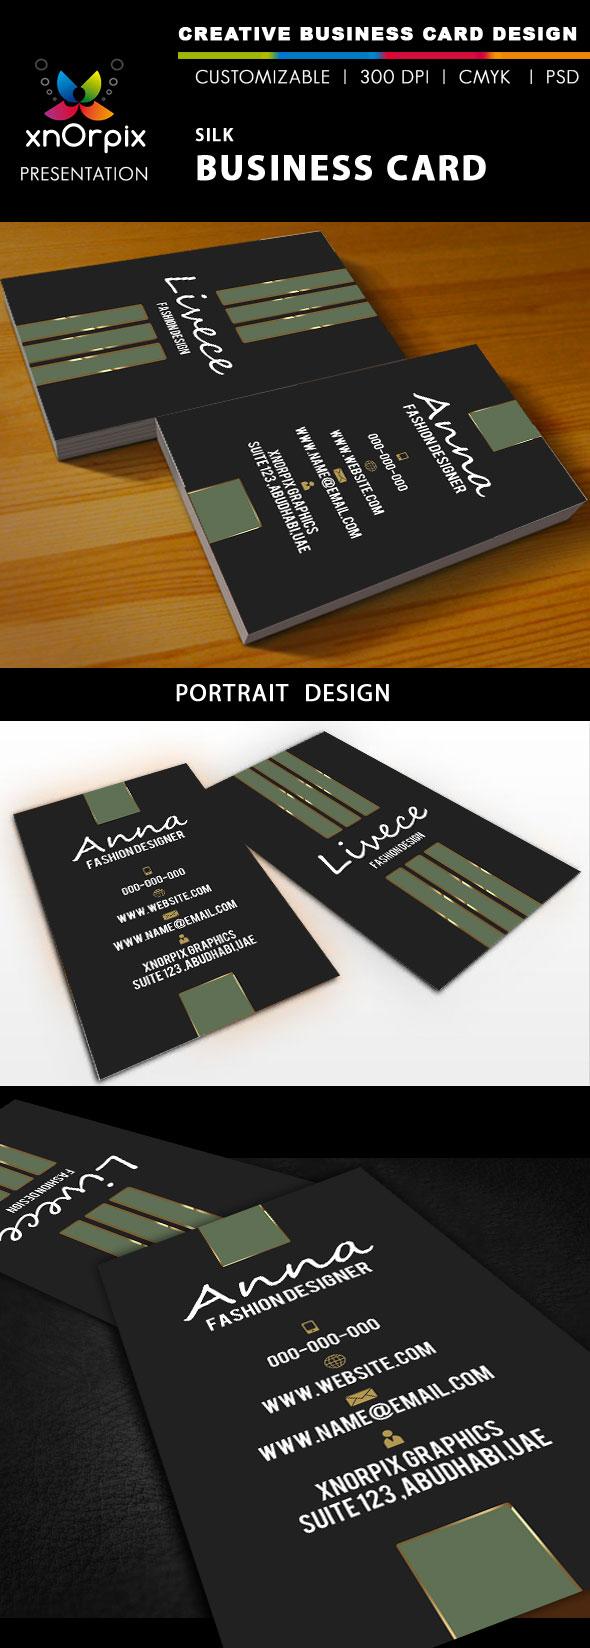 Silk Business Card